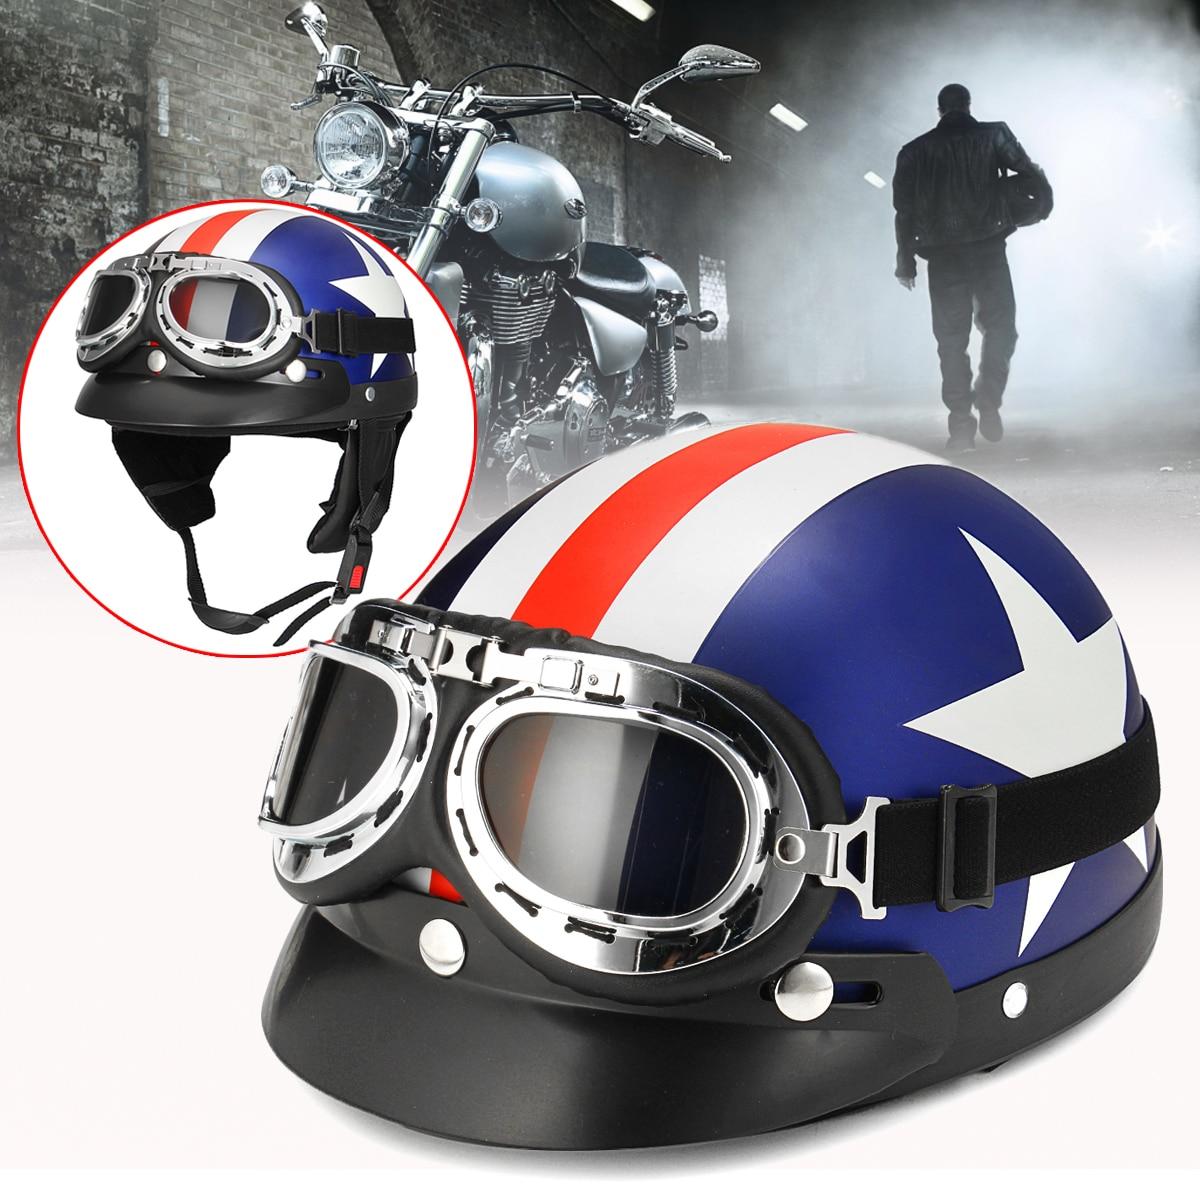 Universal ABS Motorcycle Helmet Vintage Style National flag Half Open Face Helmet Biker Scooter w/ Goggles Vintage/ Visor